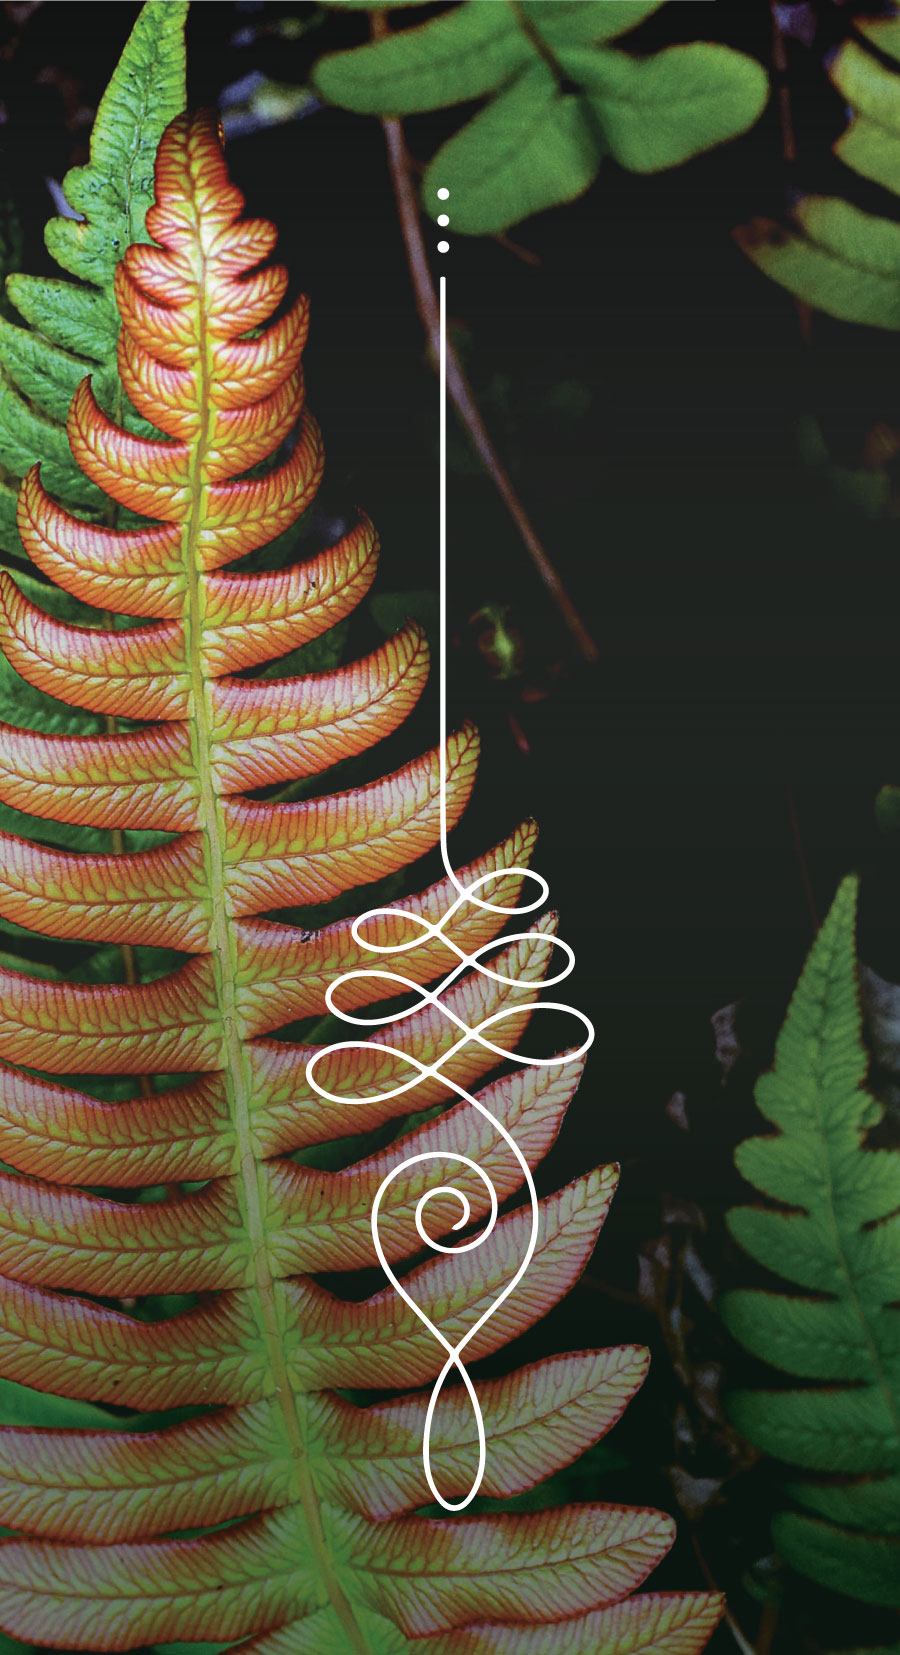 Flourish-7week-MediaKit-Graphics-2.jpg